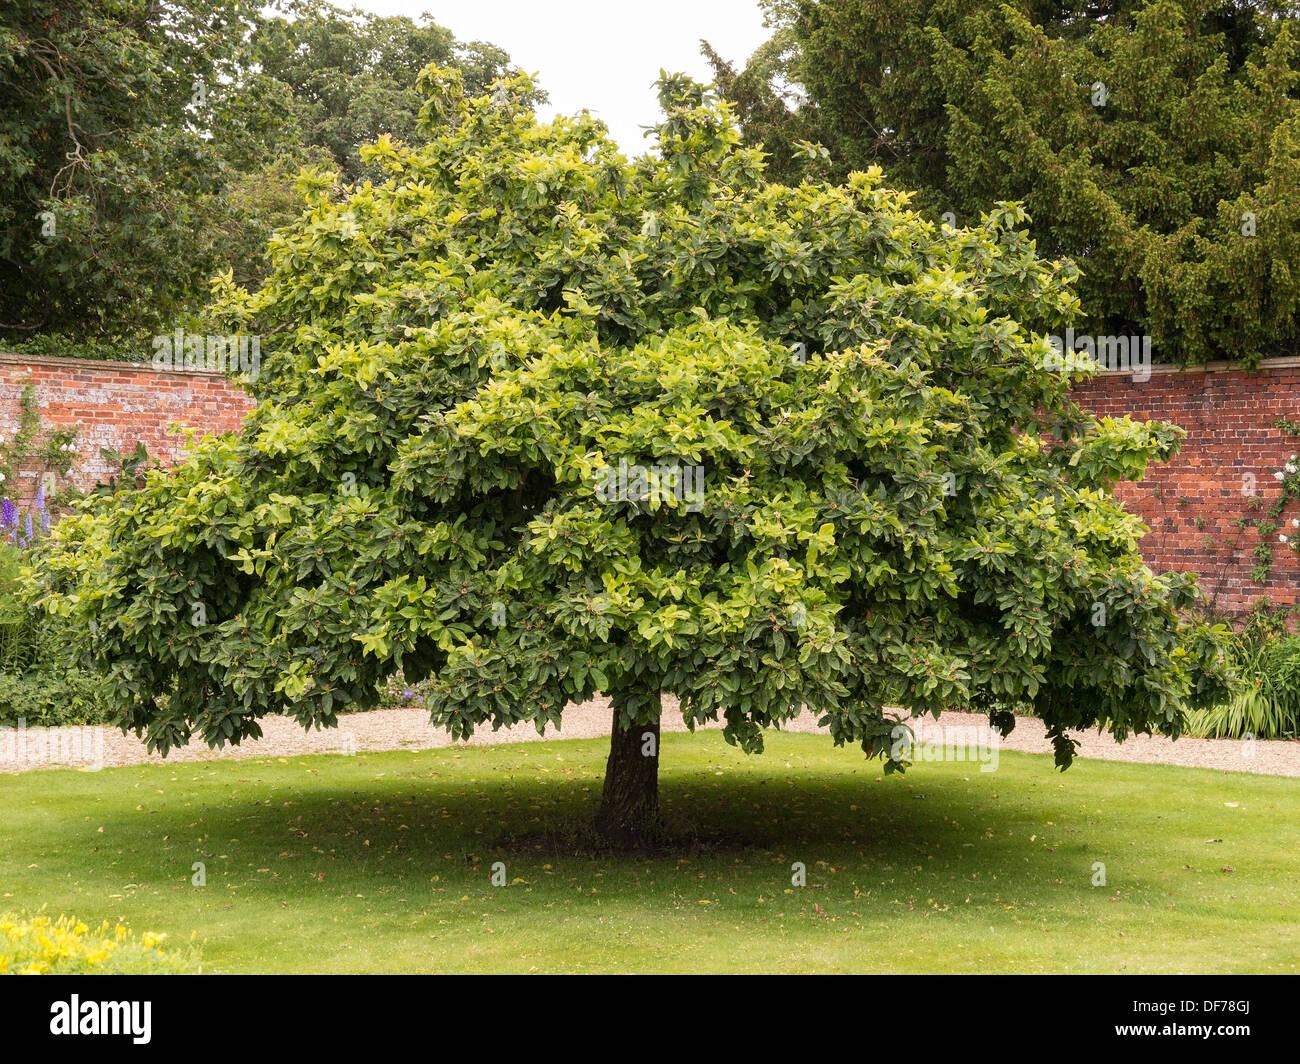 mespilus germanica medlar tree growing in grass lawn in. Black Bedroom Furniture Sets. Home Design Ideas